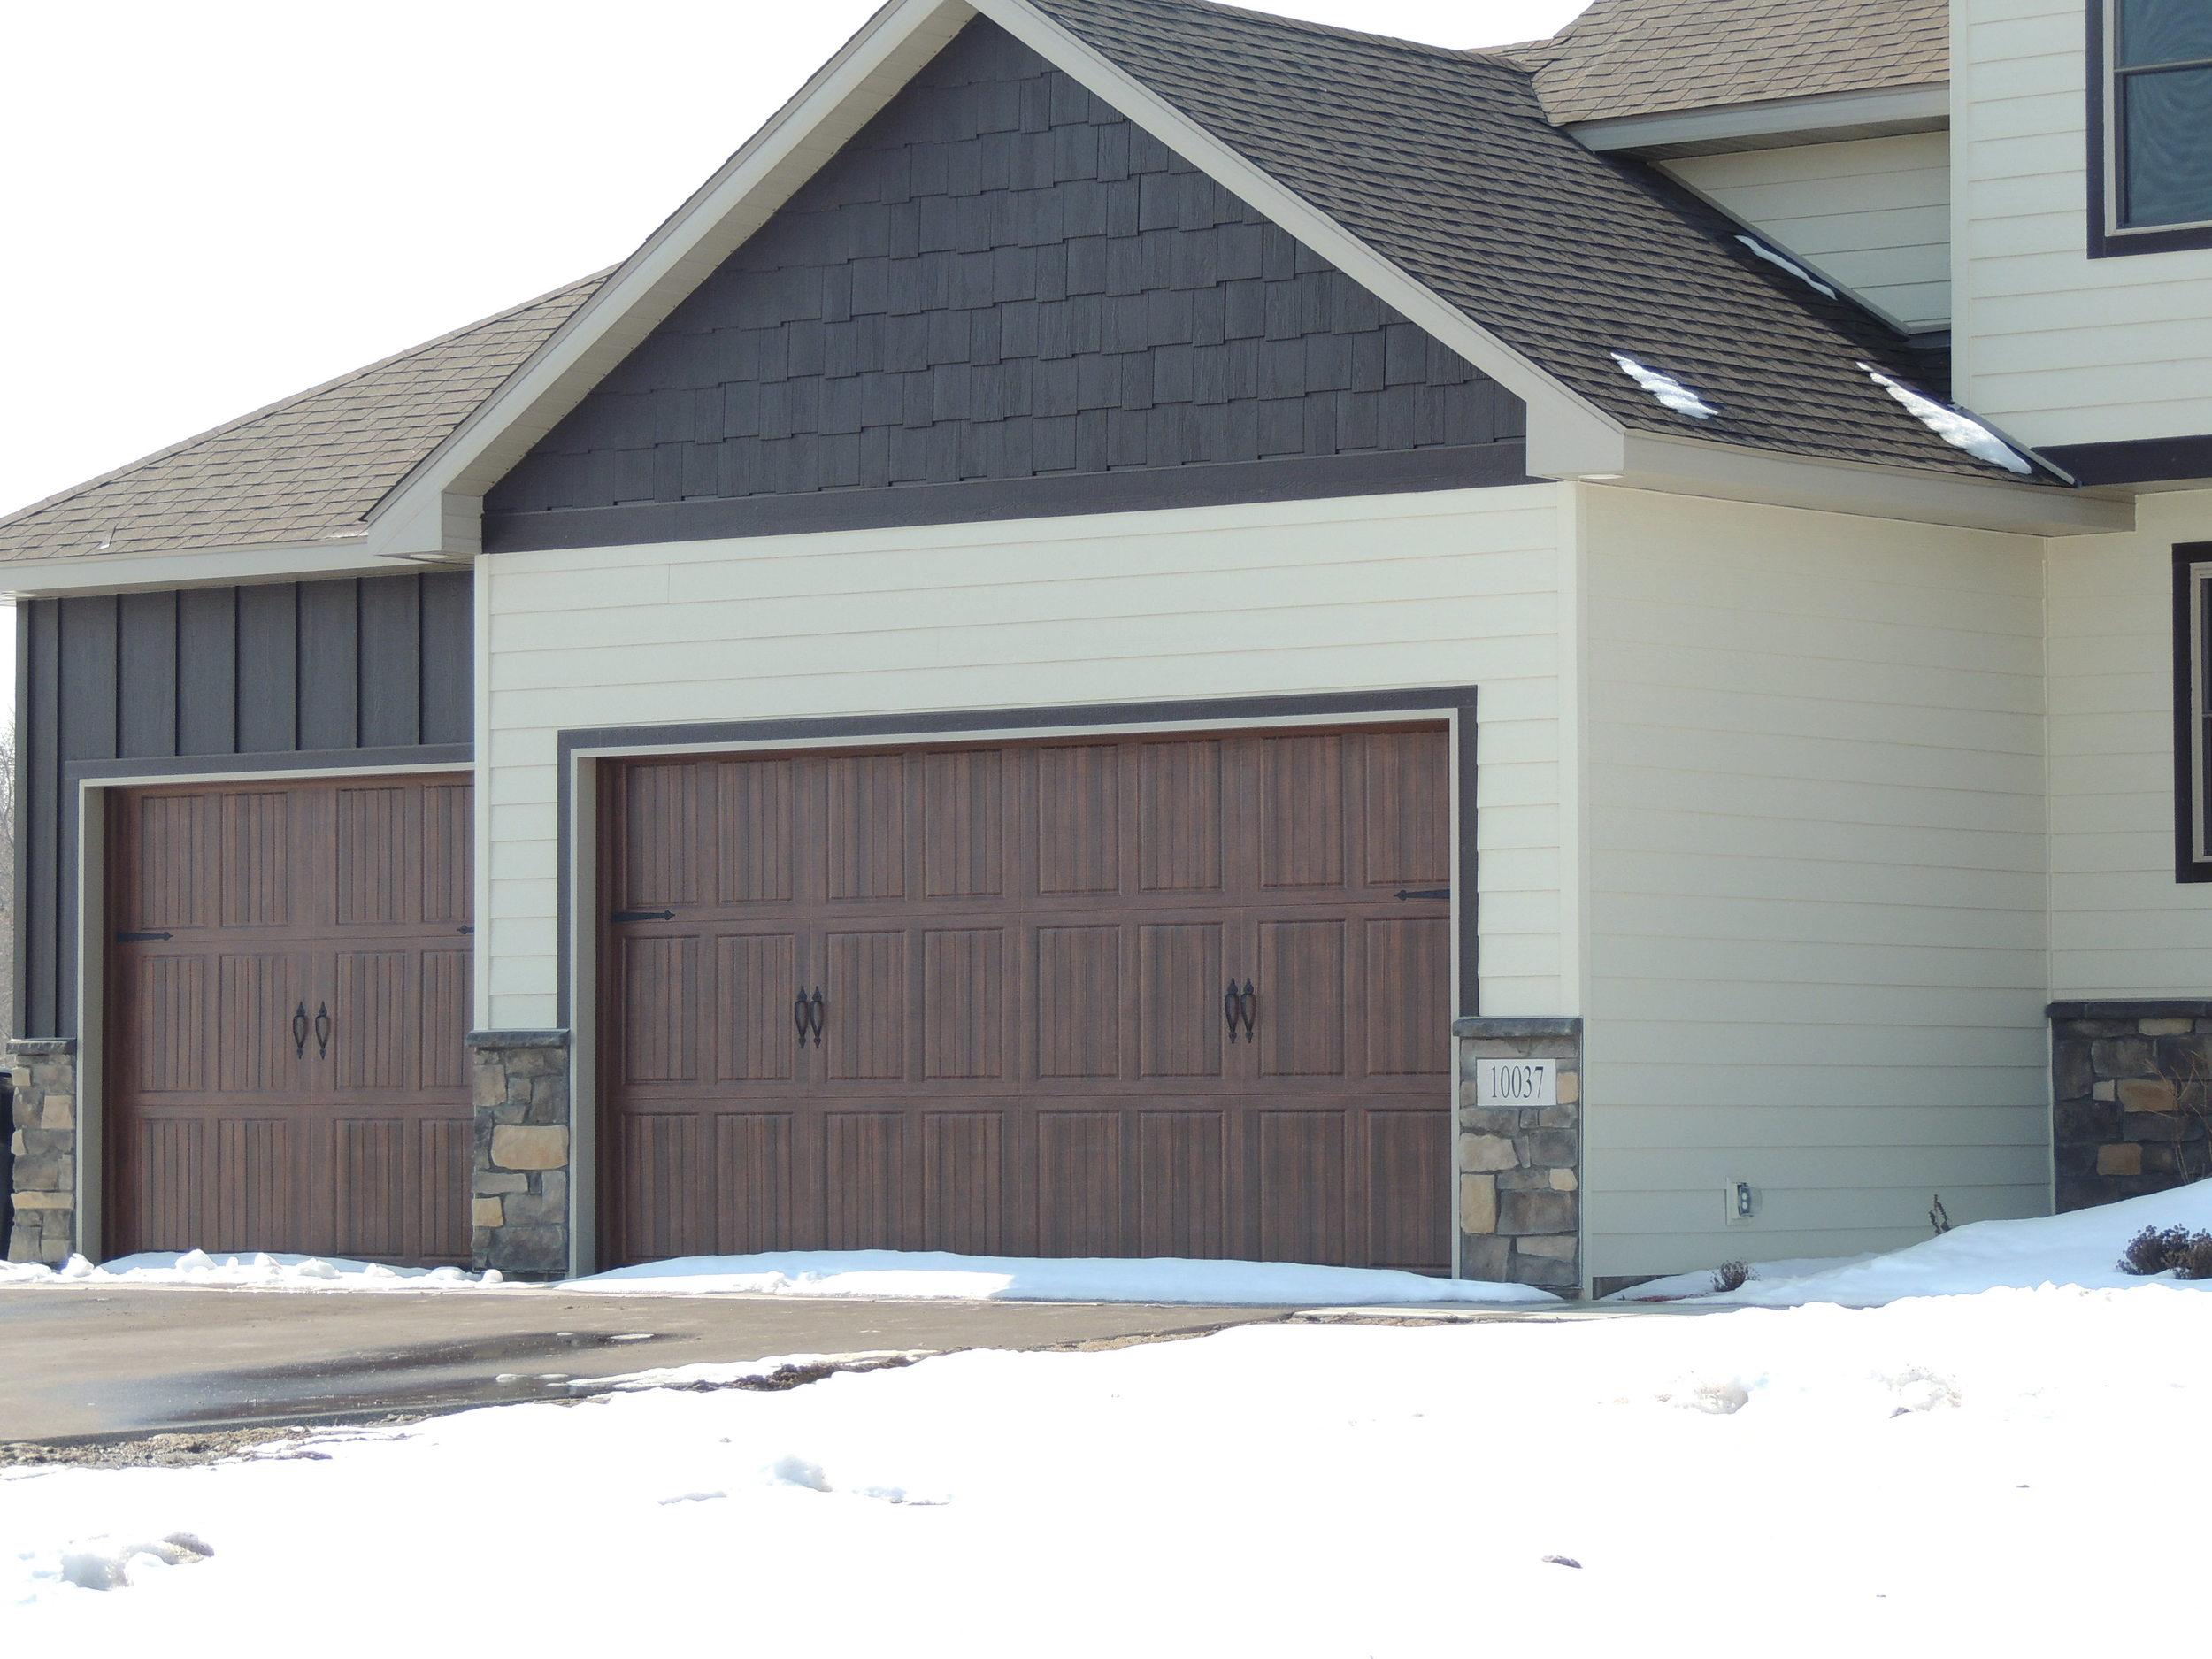 wm branch guelph installation door haws reasons garage clopay doors to rolling overhead insulated consider